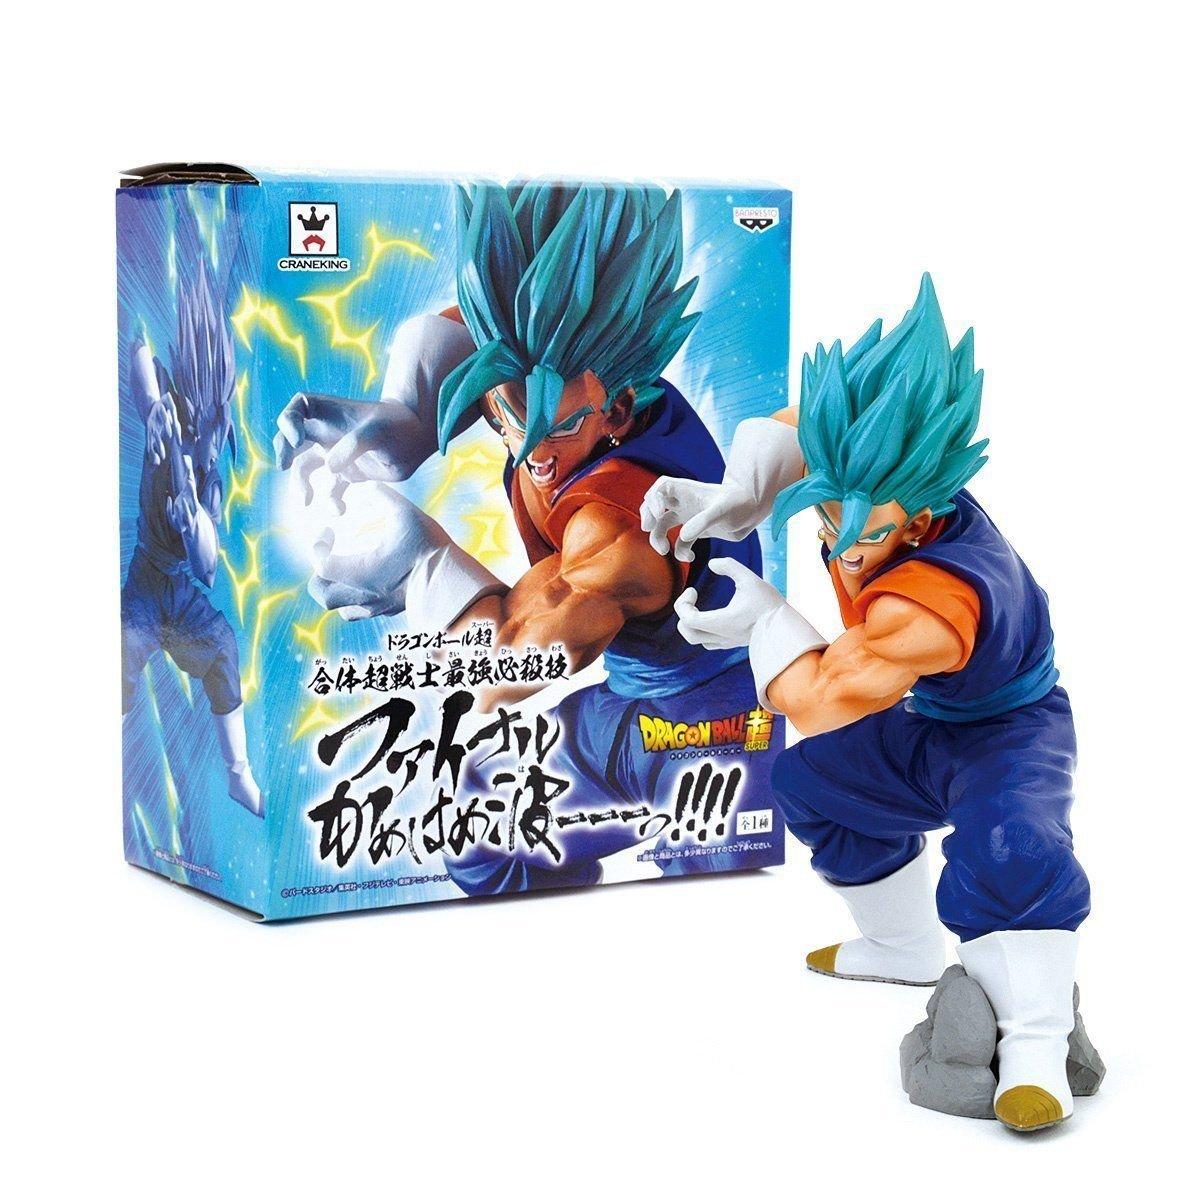 BANPRESTO 604724Scultures Dragon Ball Z, Blau Vegito Final Kameha Action Figur, 16cm 16cm